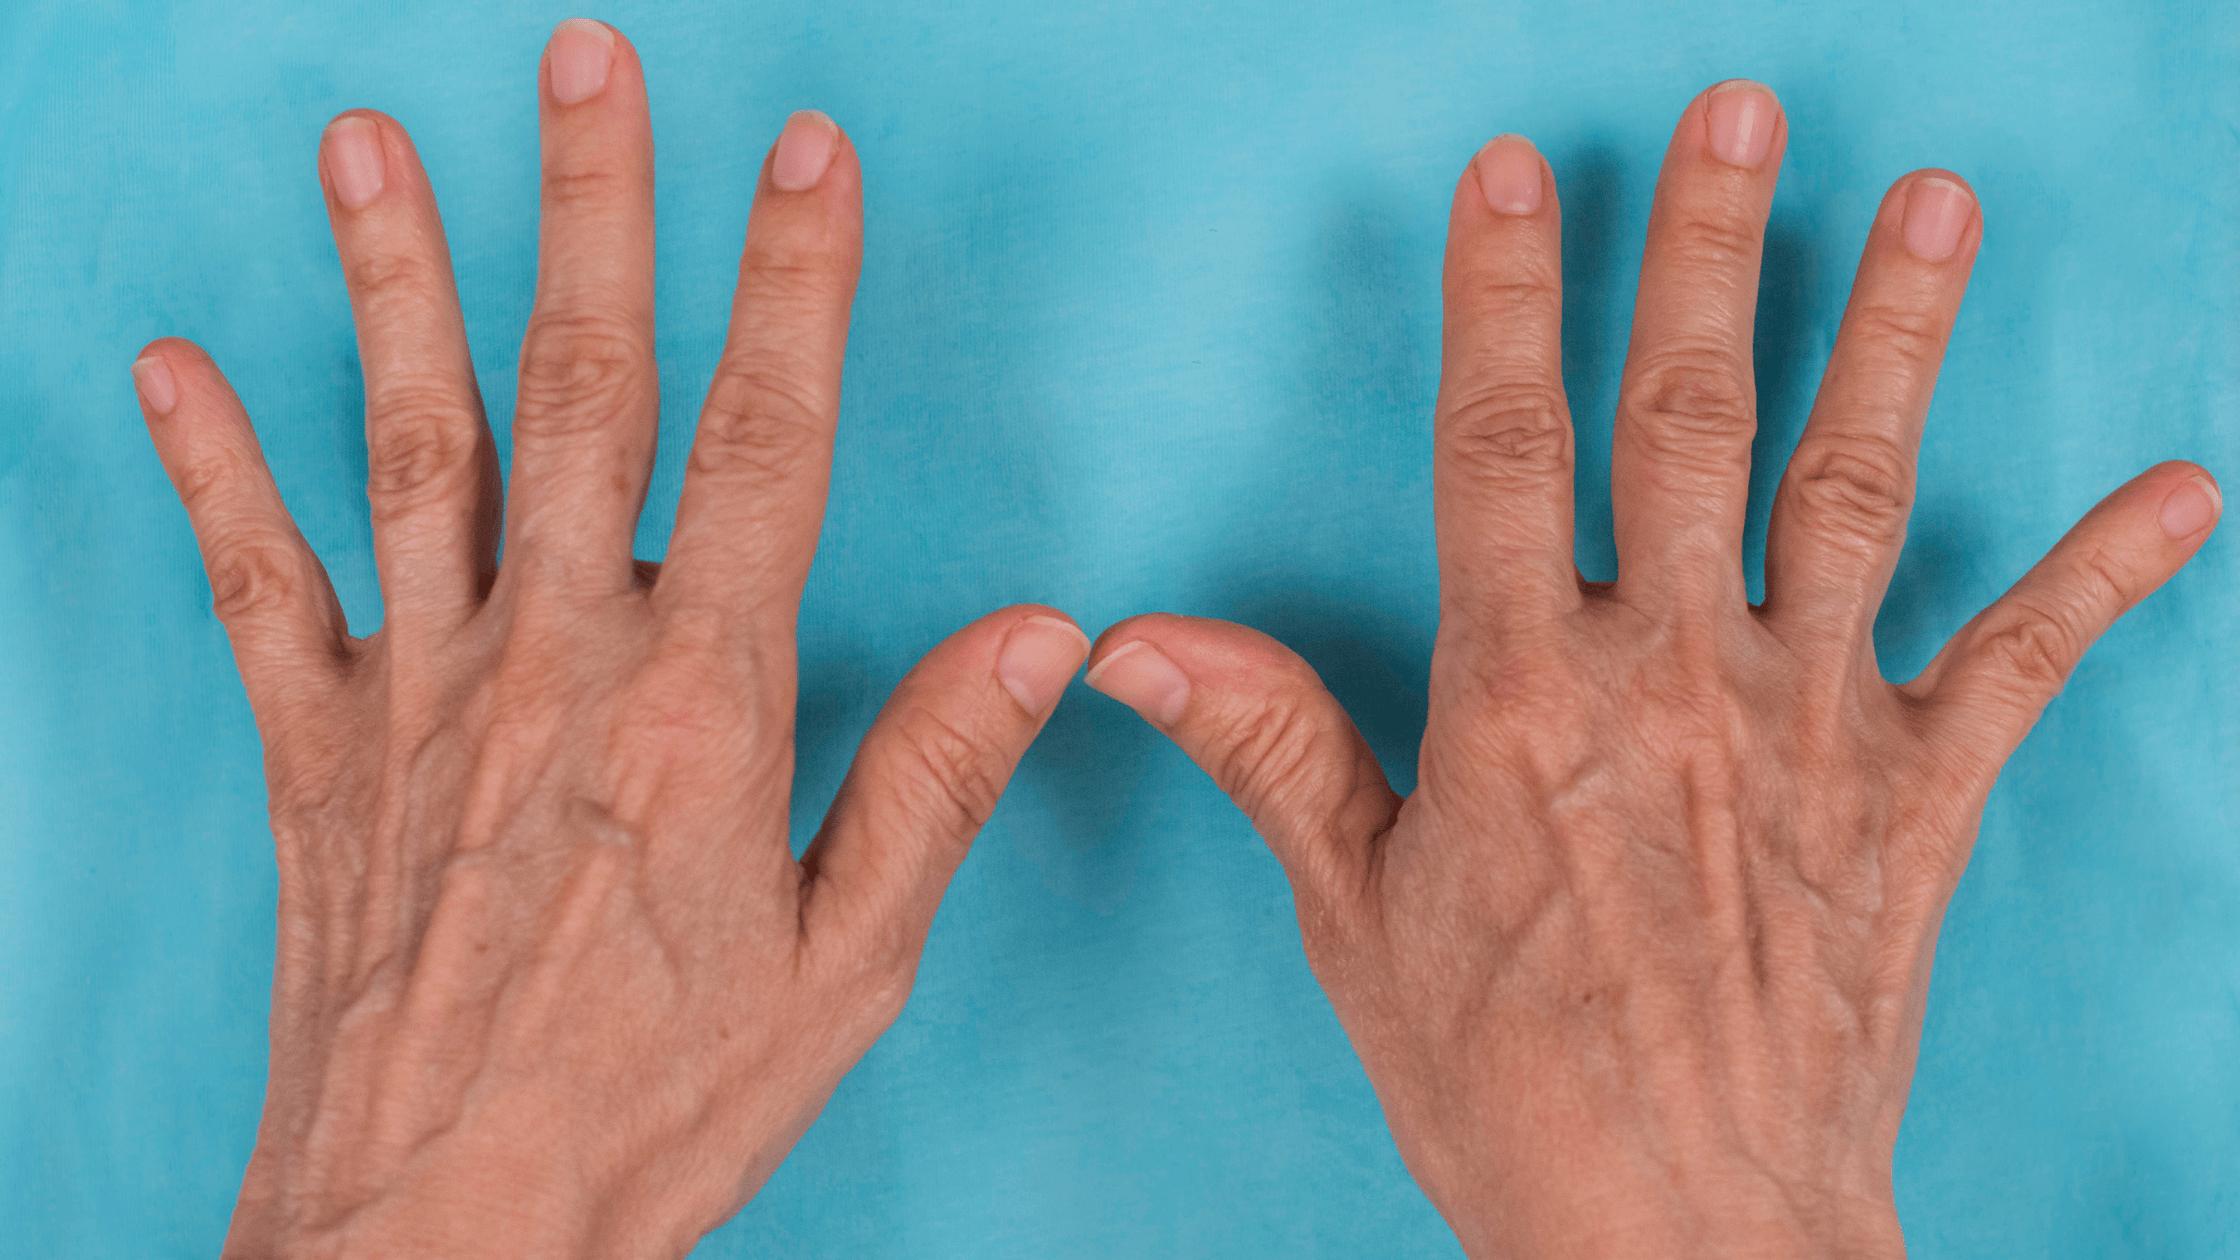 Affinity Health Dispels The Biggest Myths About Rheumatoid Arthritis